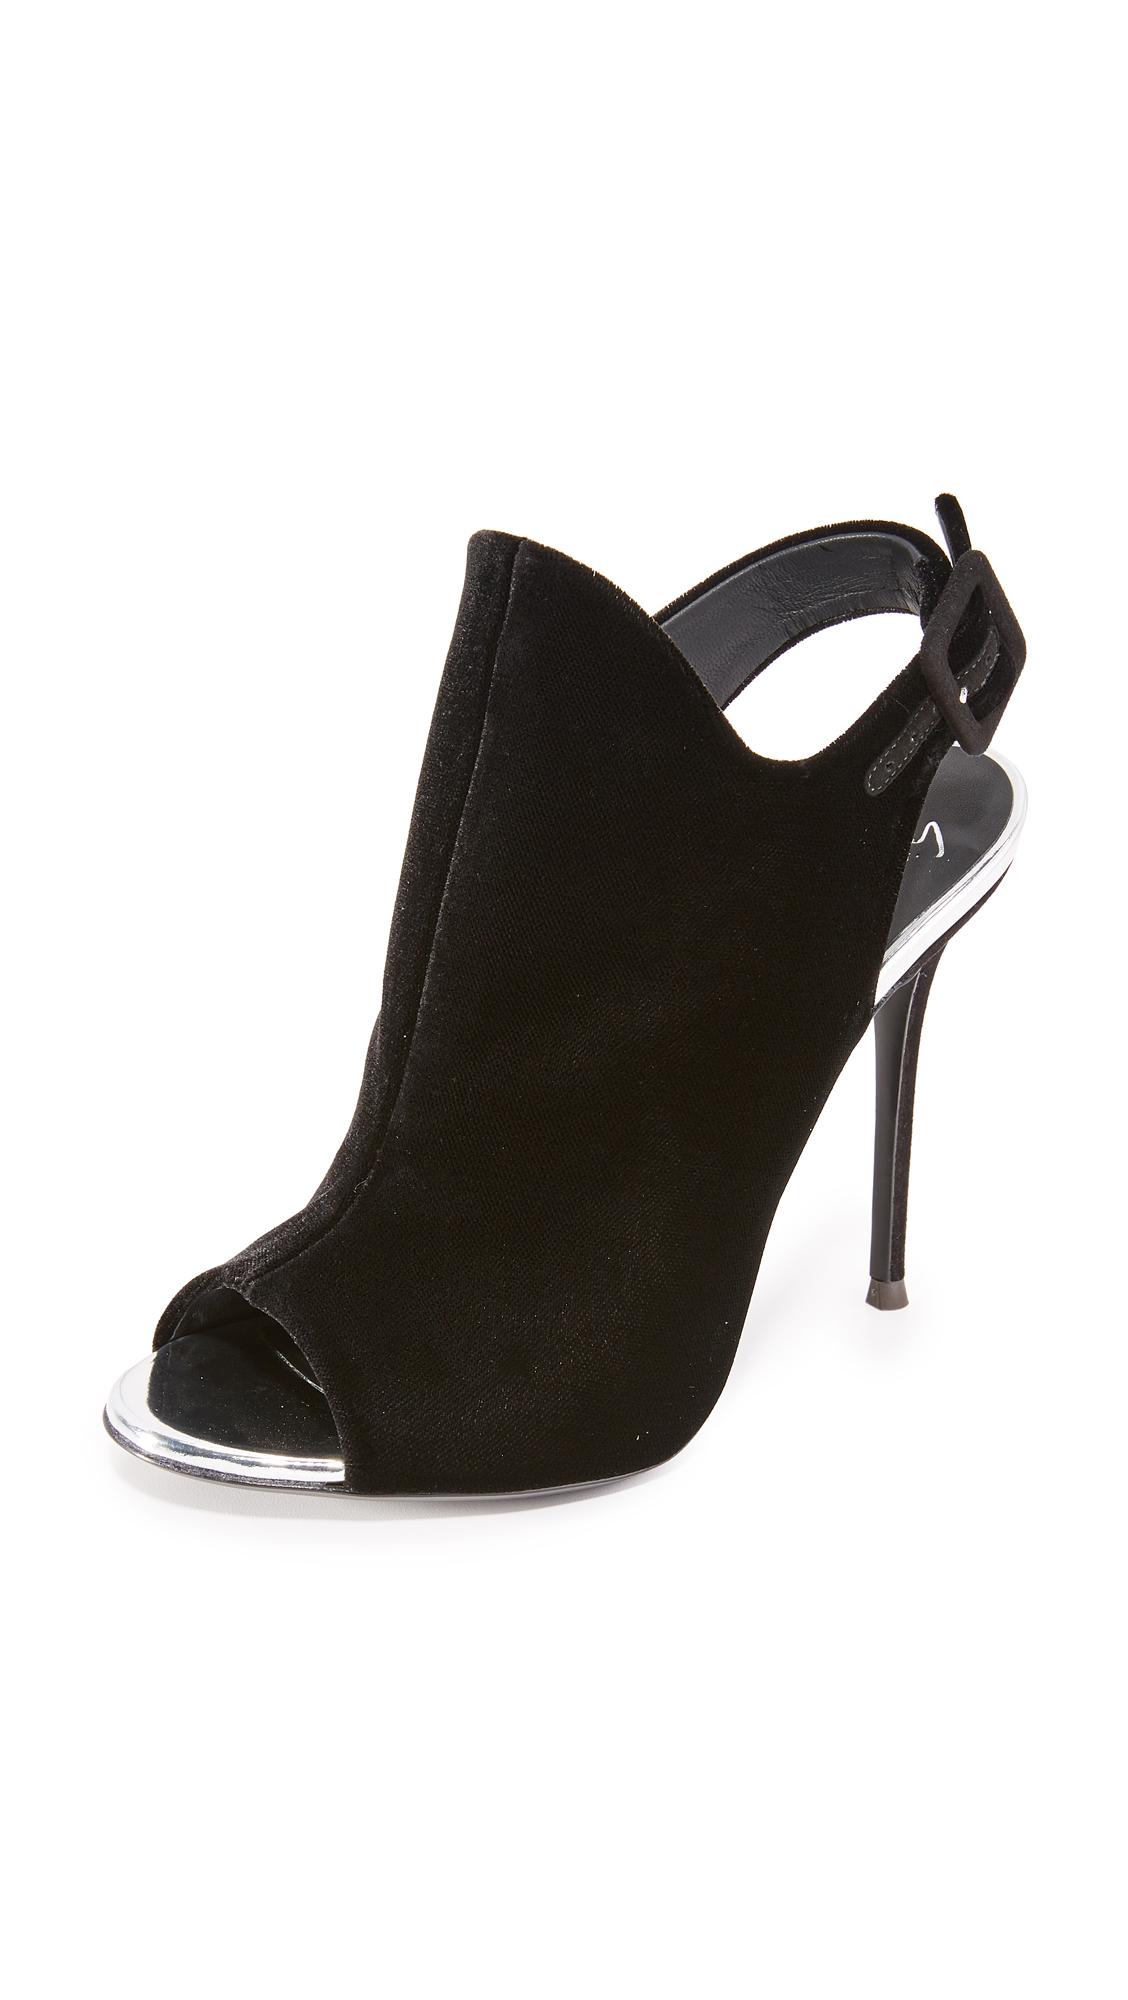 Giuseppe Zanotti Mistico Sandal Heels - Nero